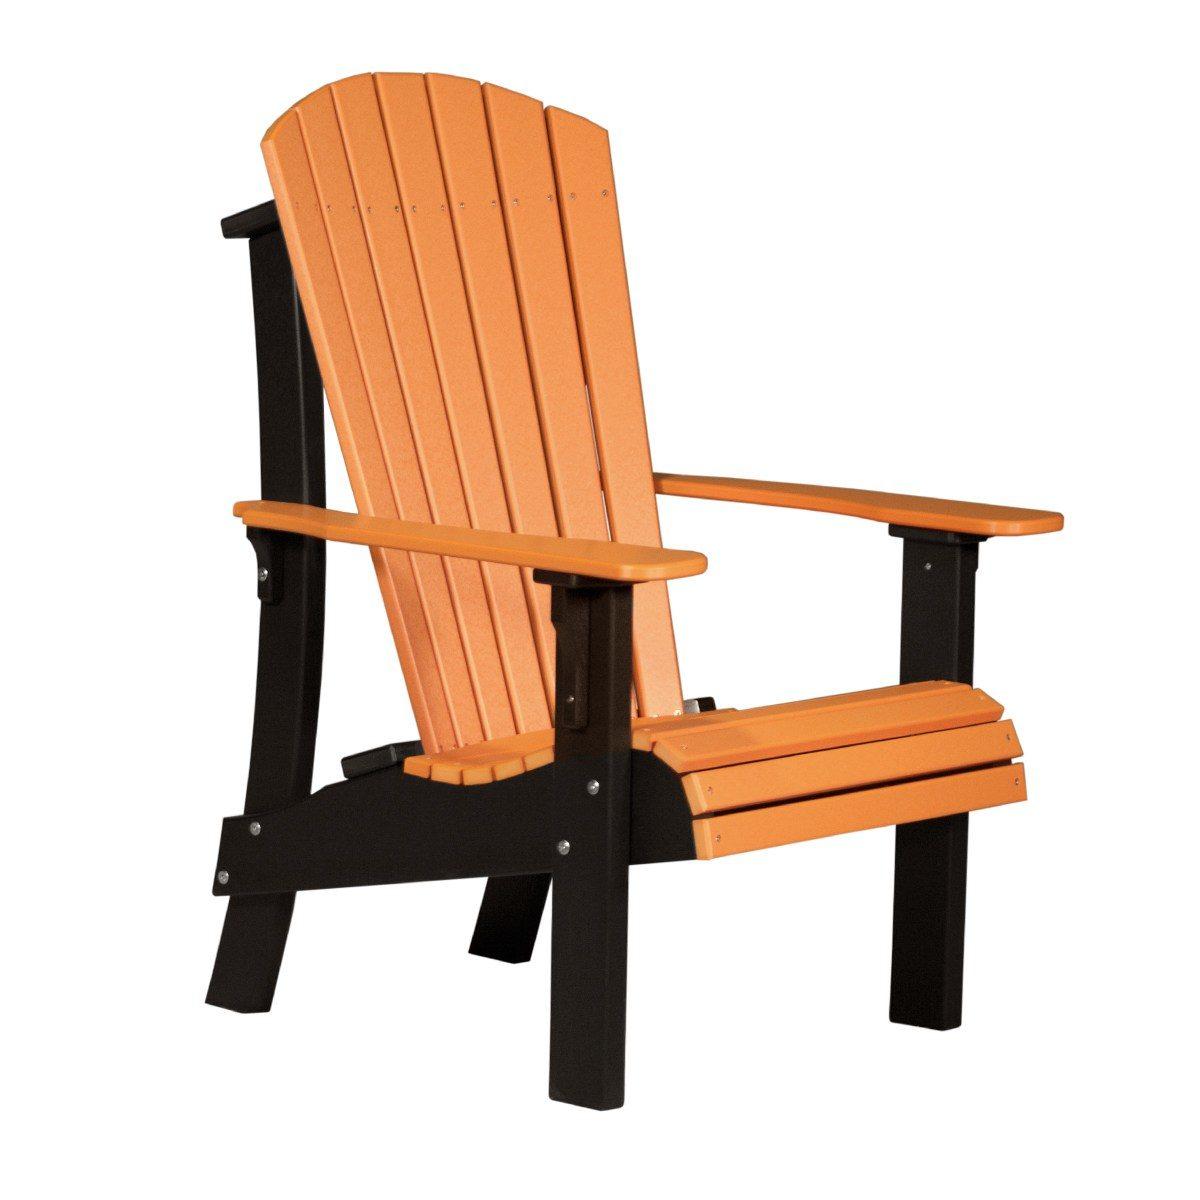 Royal Adirondack Chair - Tangerine & Black